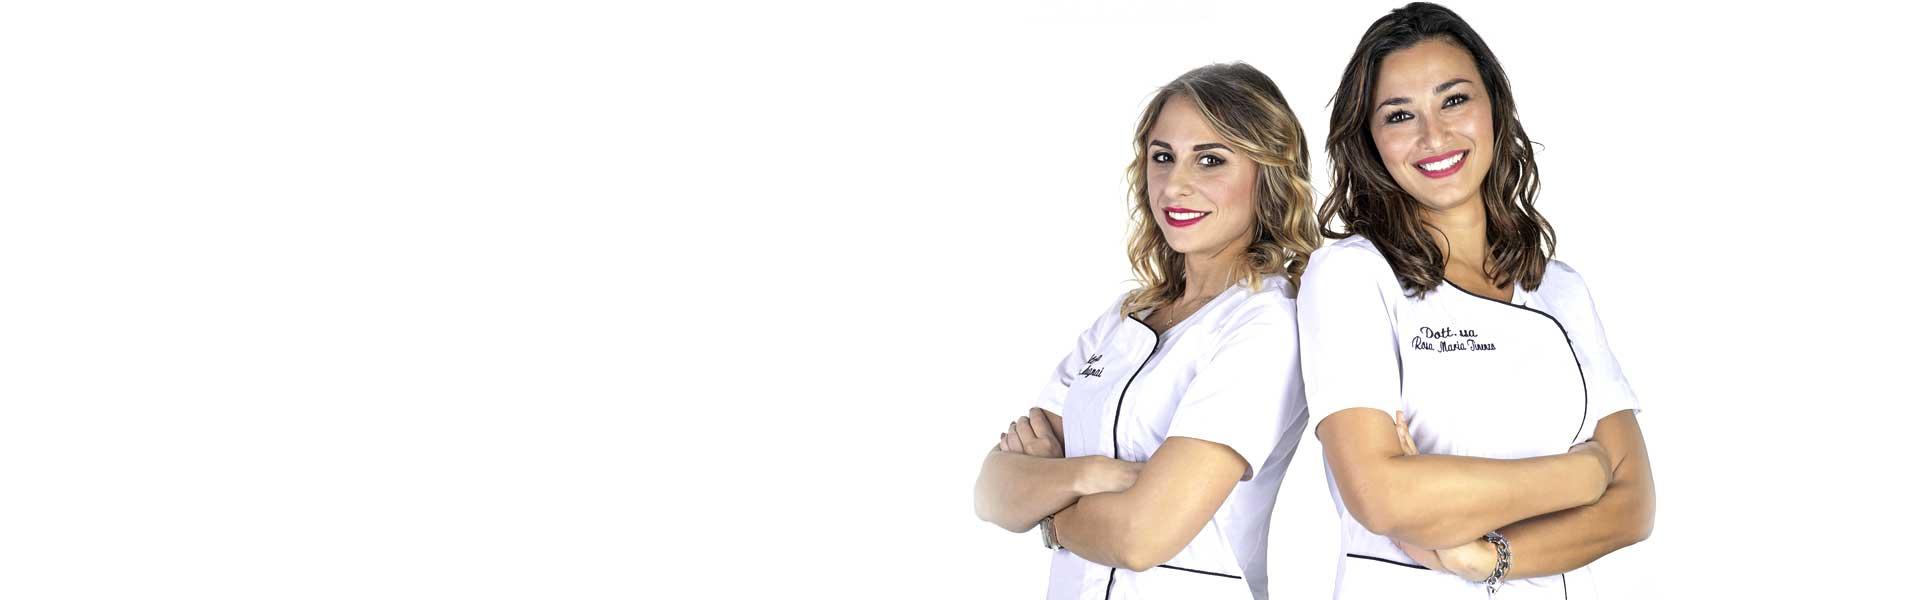 FIsioterapia dermatofunzionale & riabilitazione